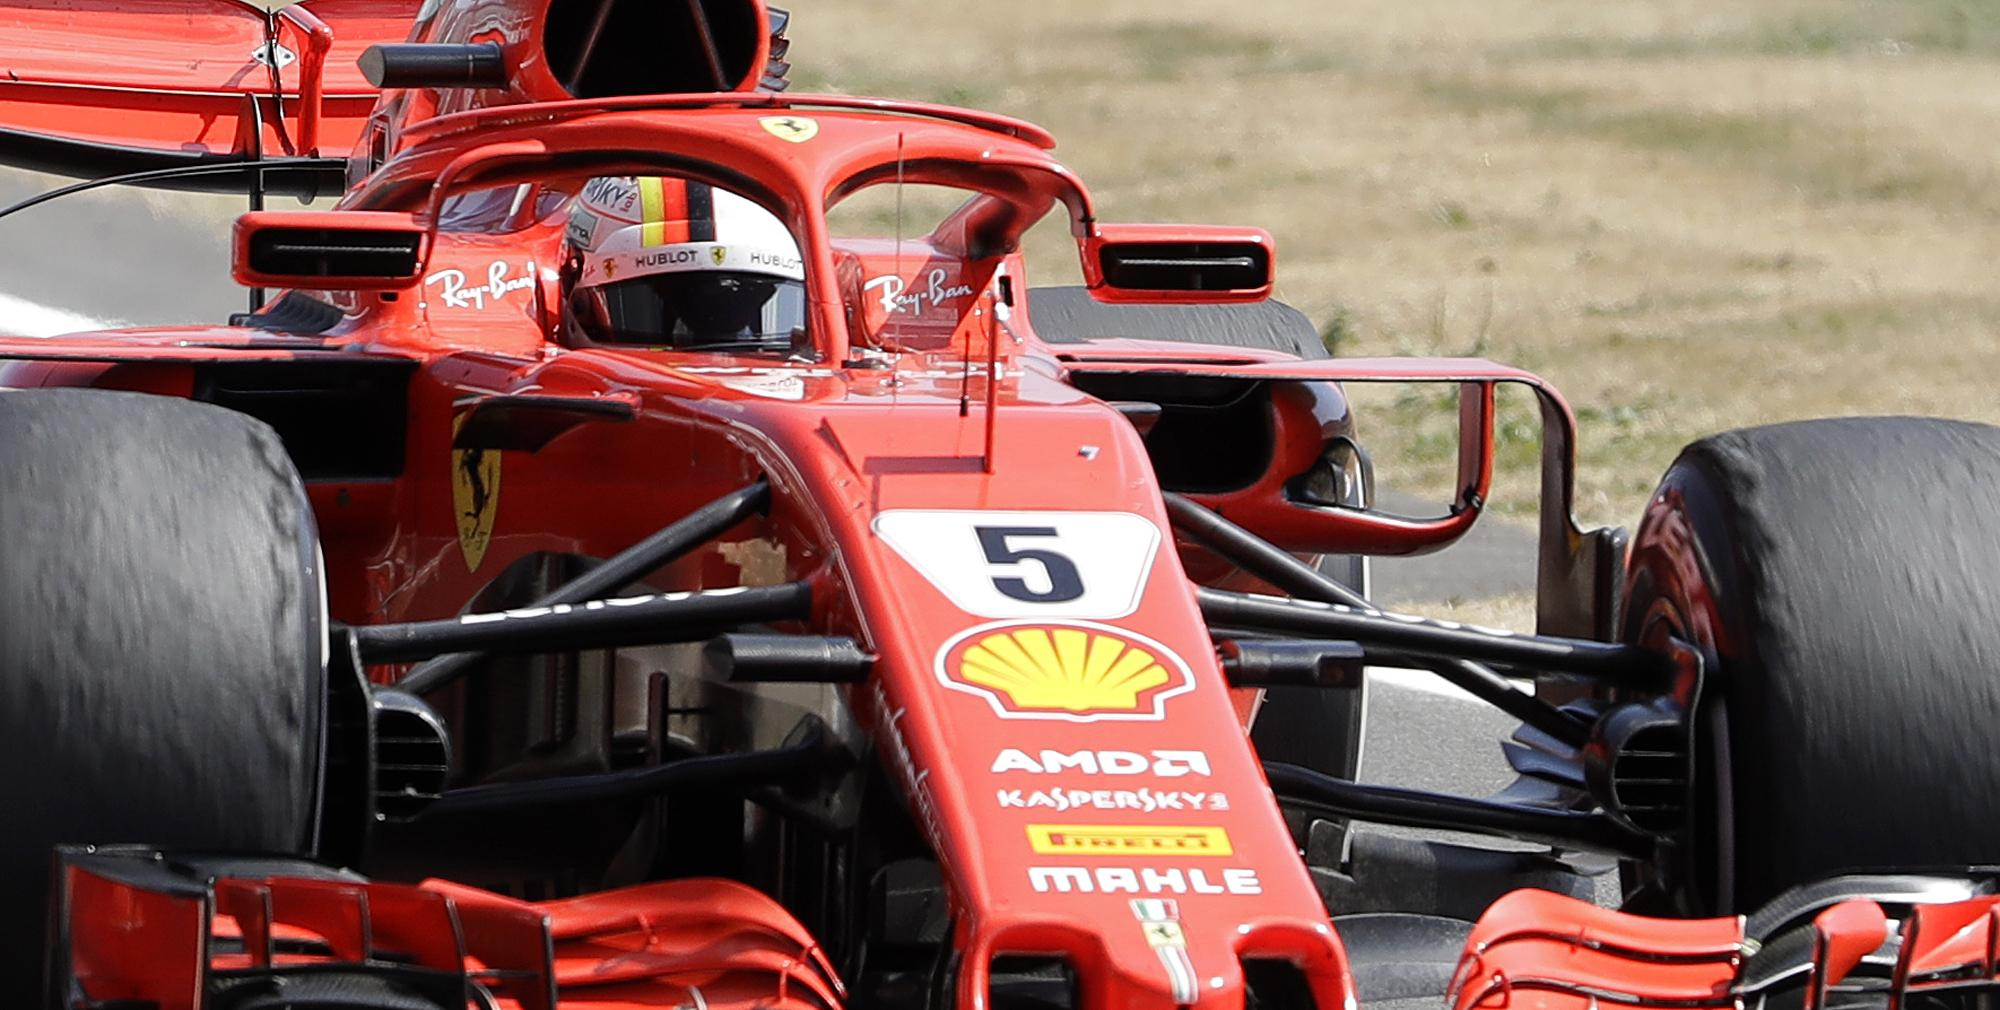 Seb Vettel claimed the British Grand Prix at Silverstone